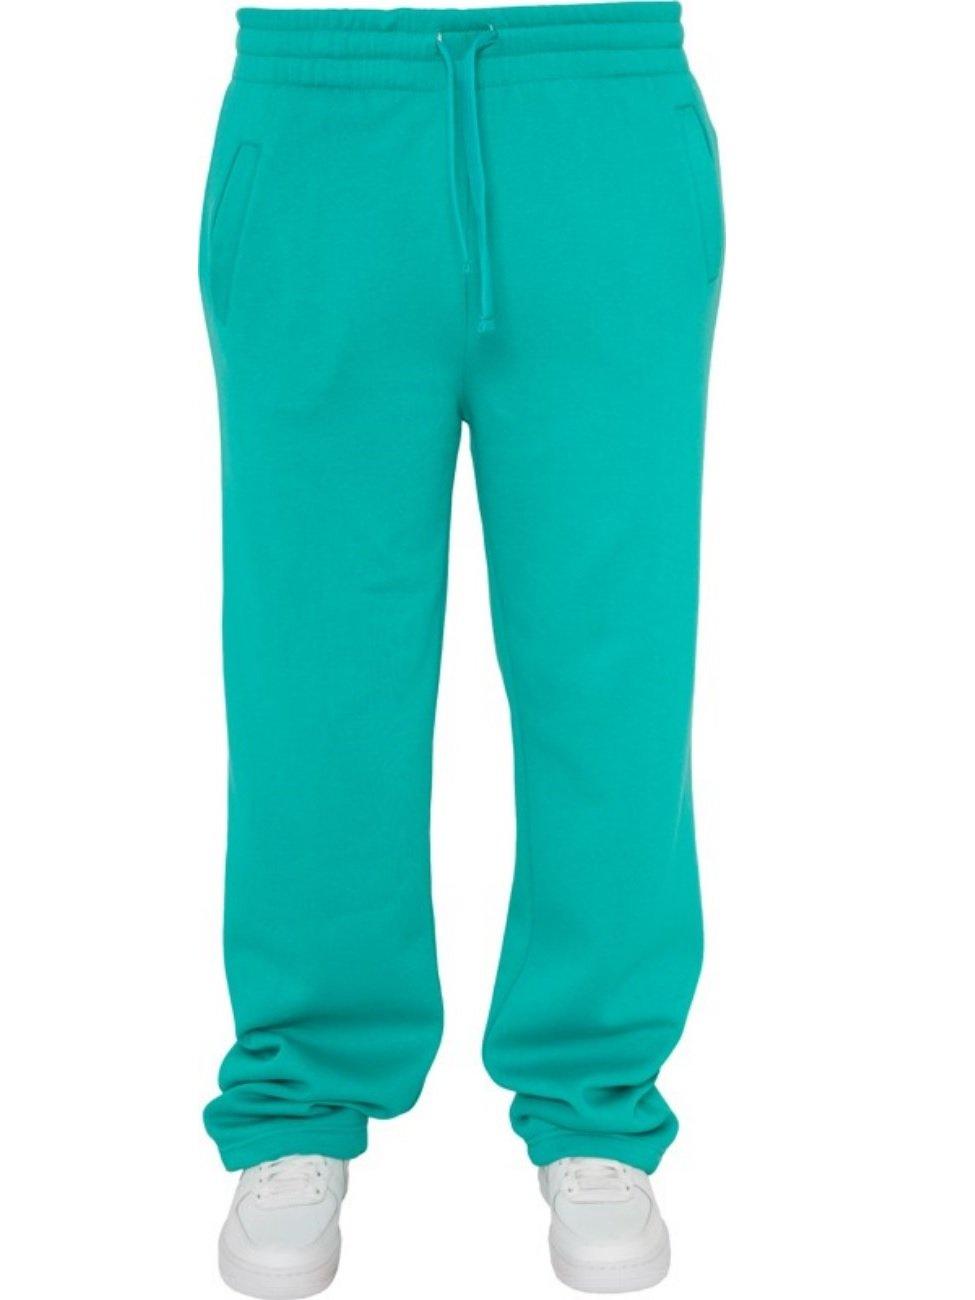 Urban Classics TB078 Damen Sporthose, blau,M